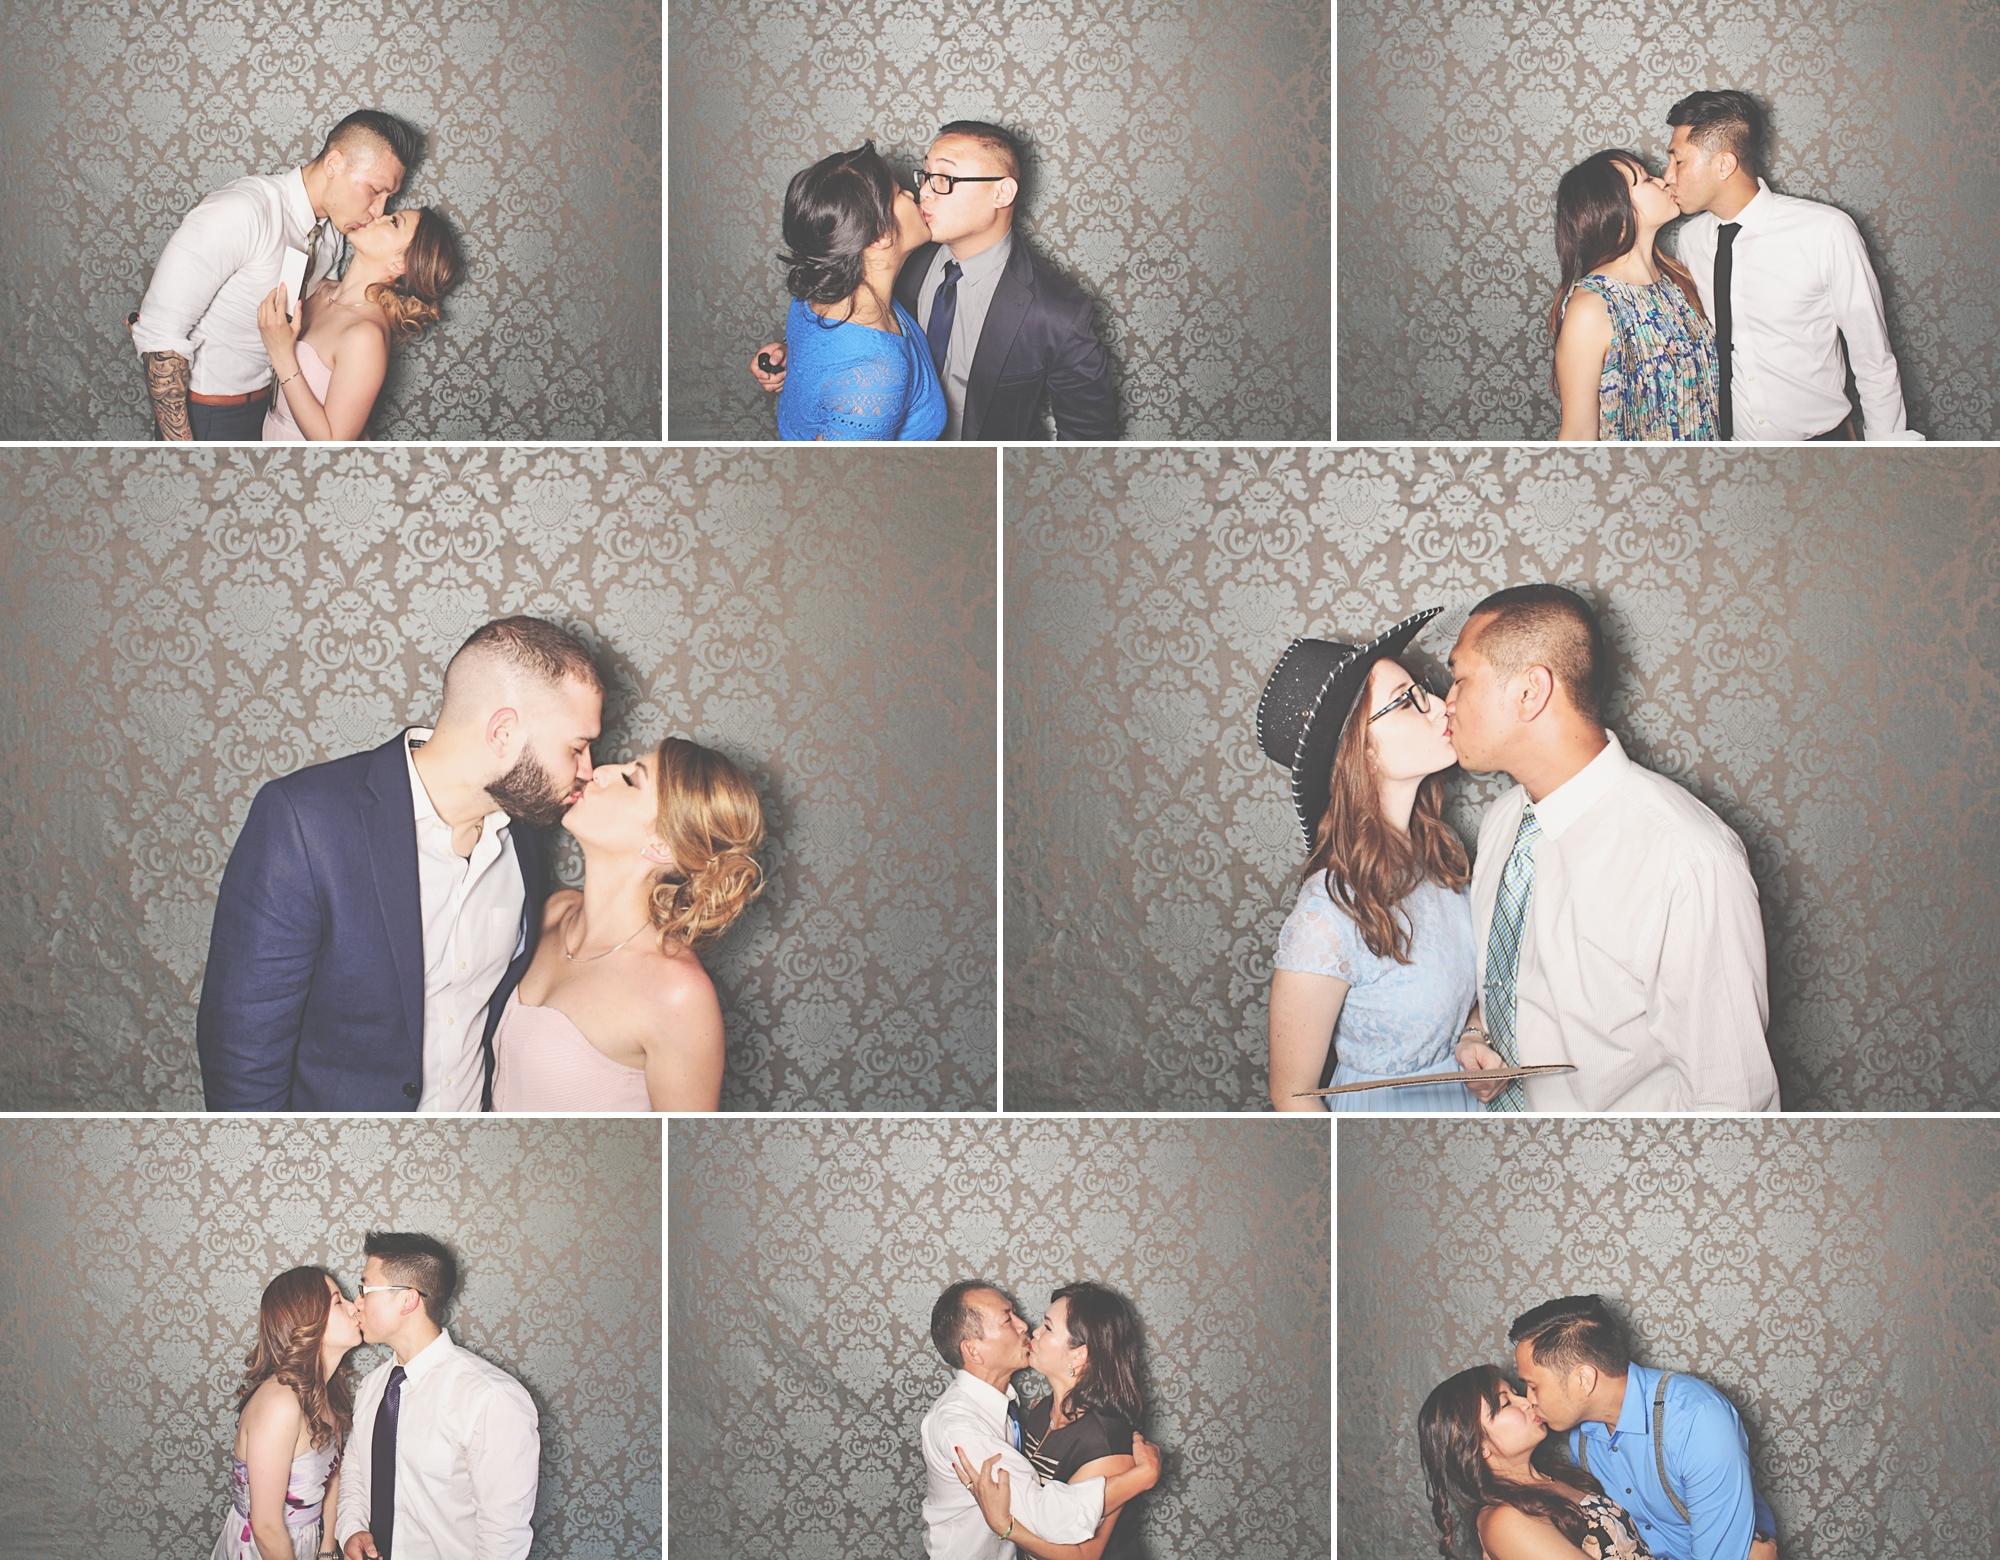 Wedding PhotoBooth - The Wright Farm - RobotBooth 11